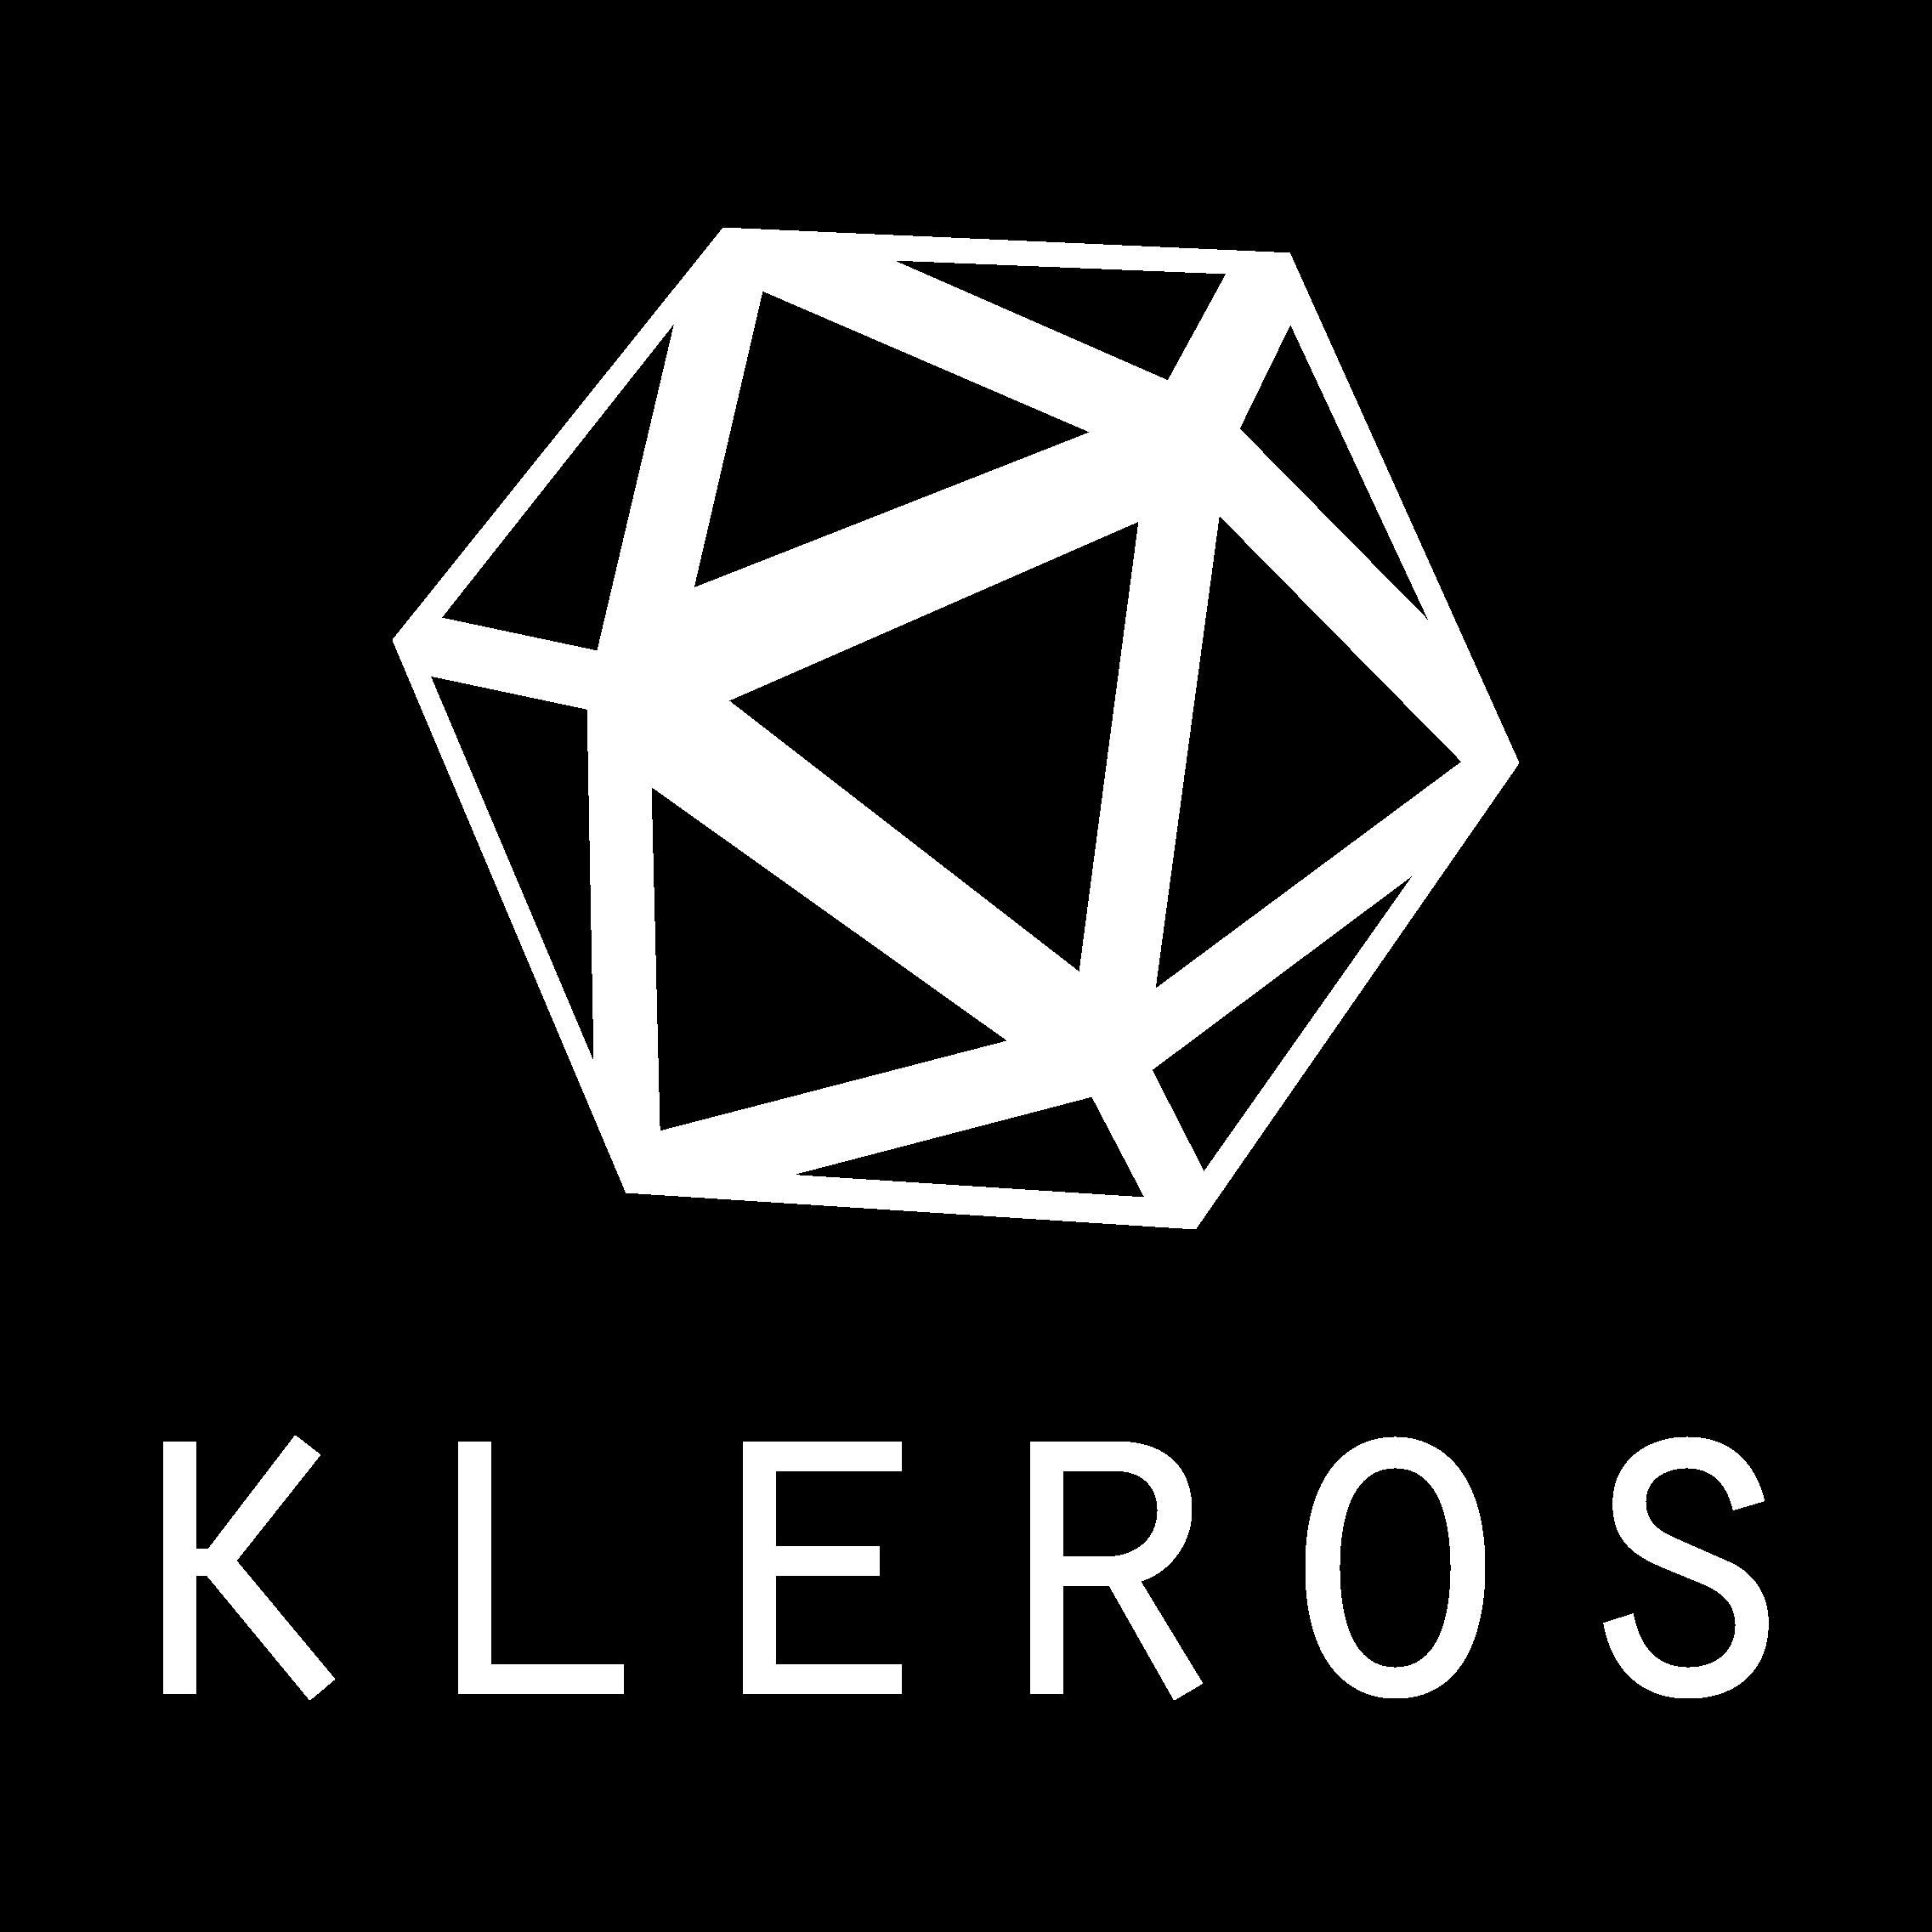 kleros-logo-vertical-fullwhite.png